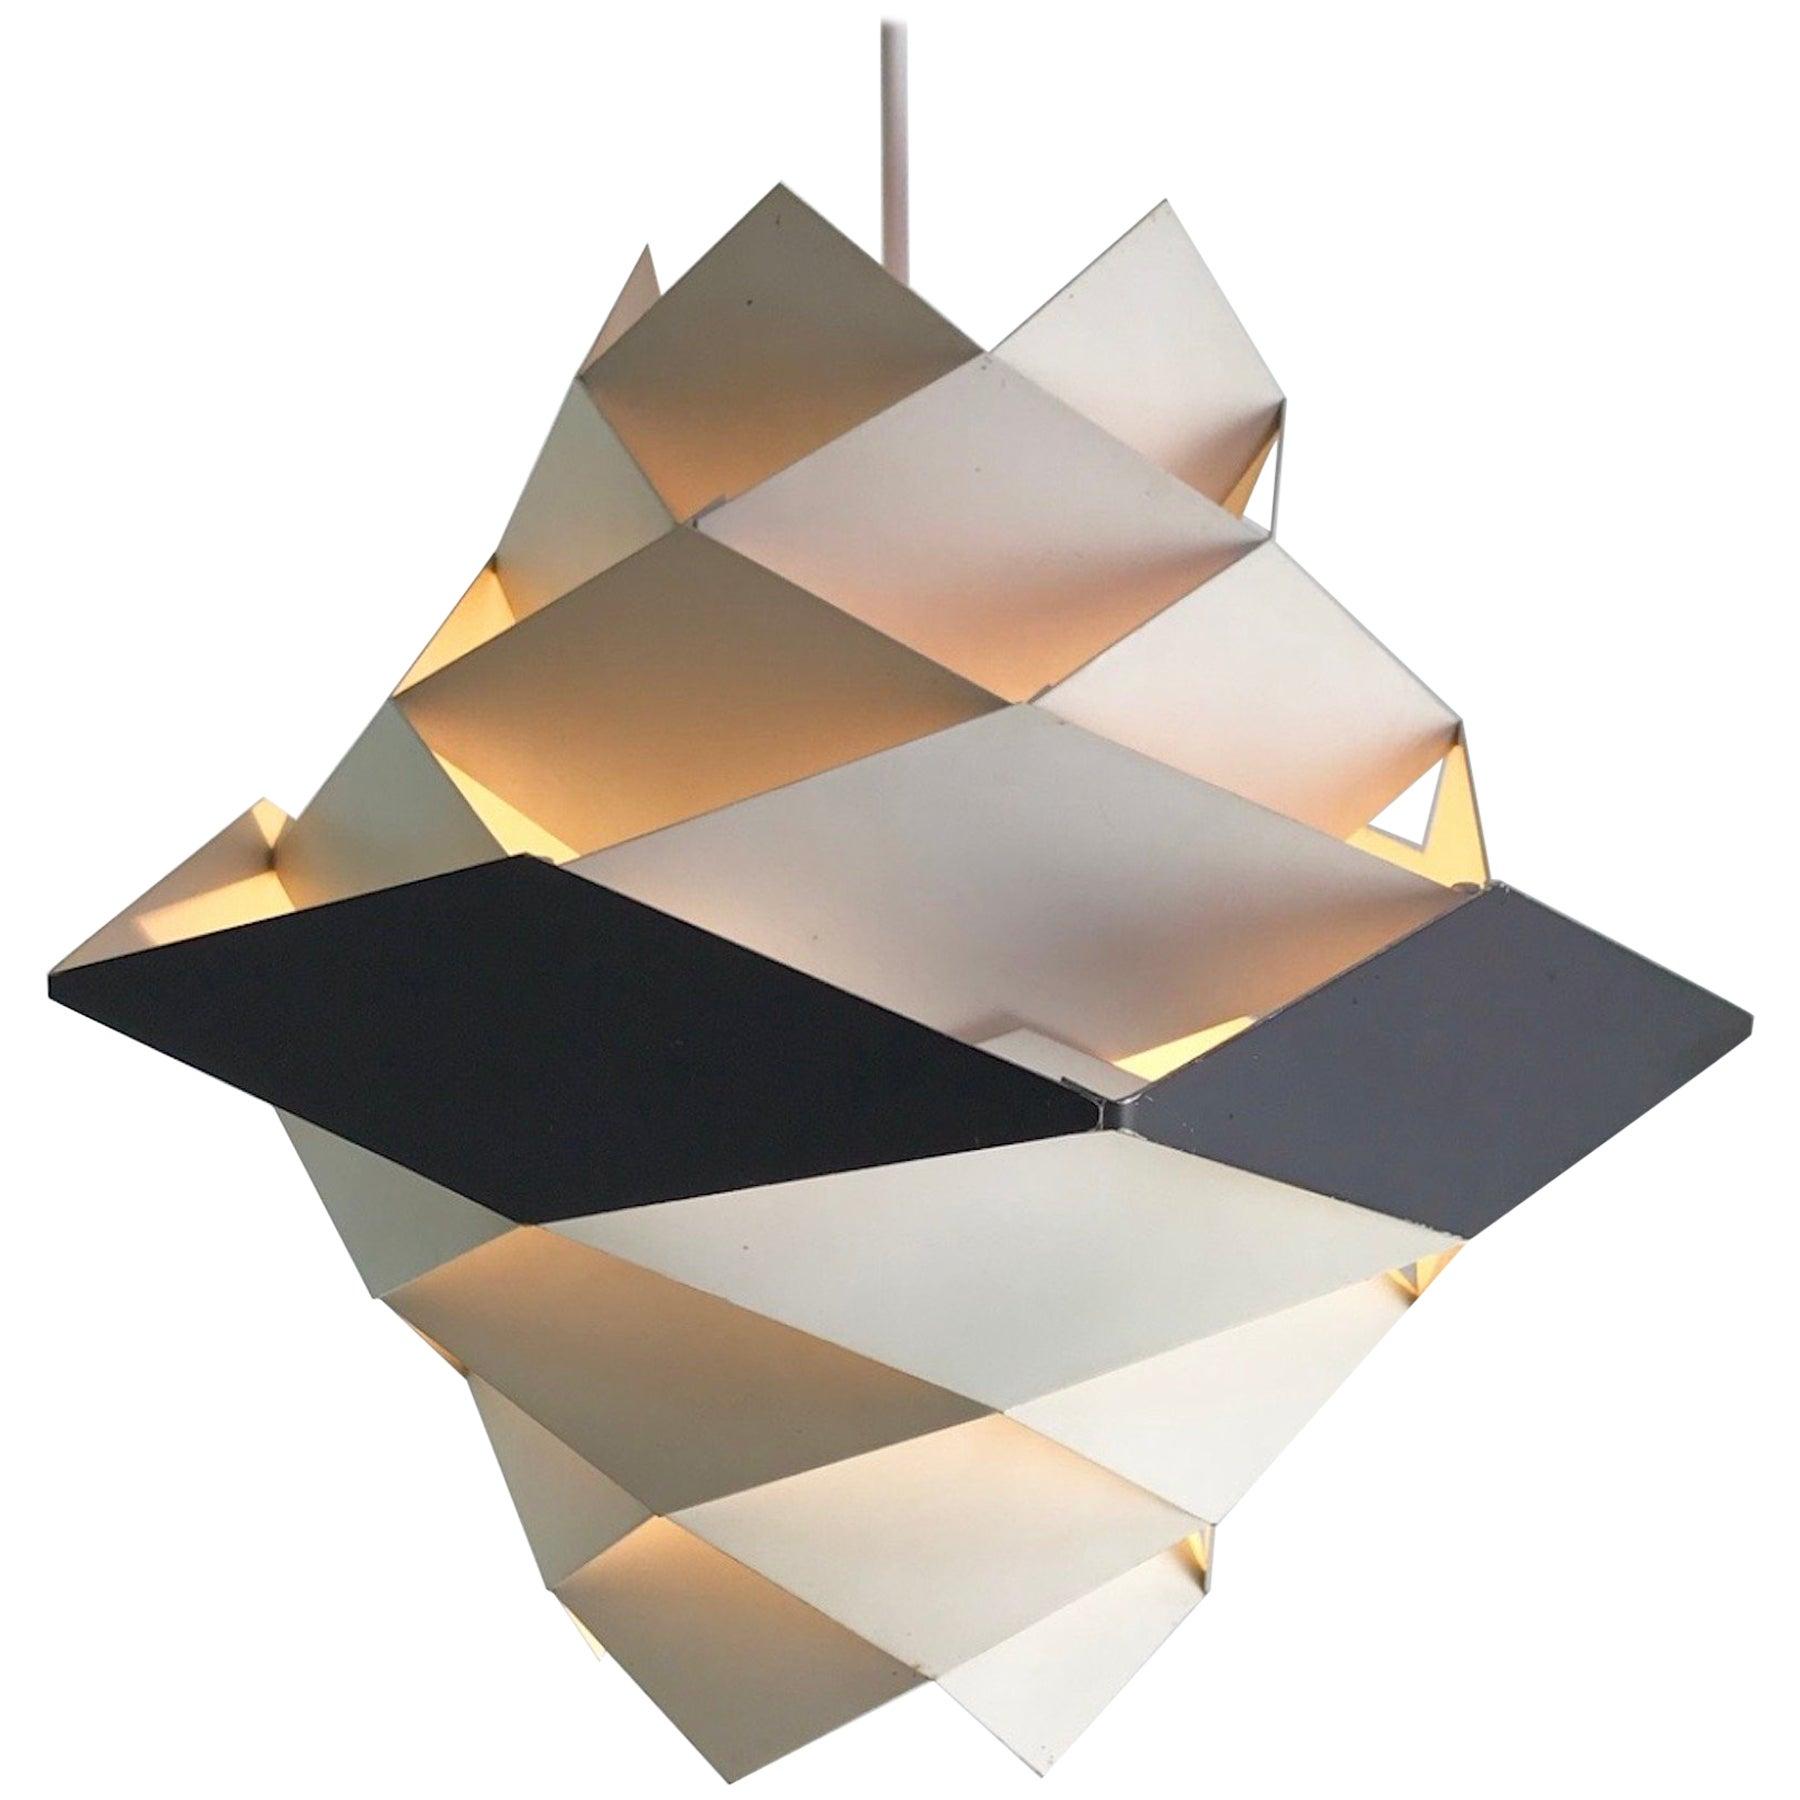 Rare Danish Ceiling Pendant by Preben Dal for Hans Følsgaard AS, Mid-1960s